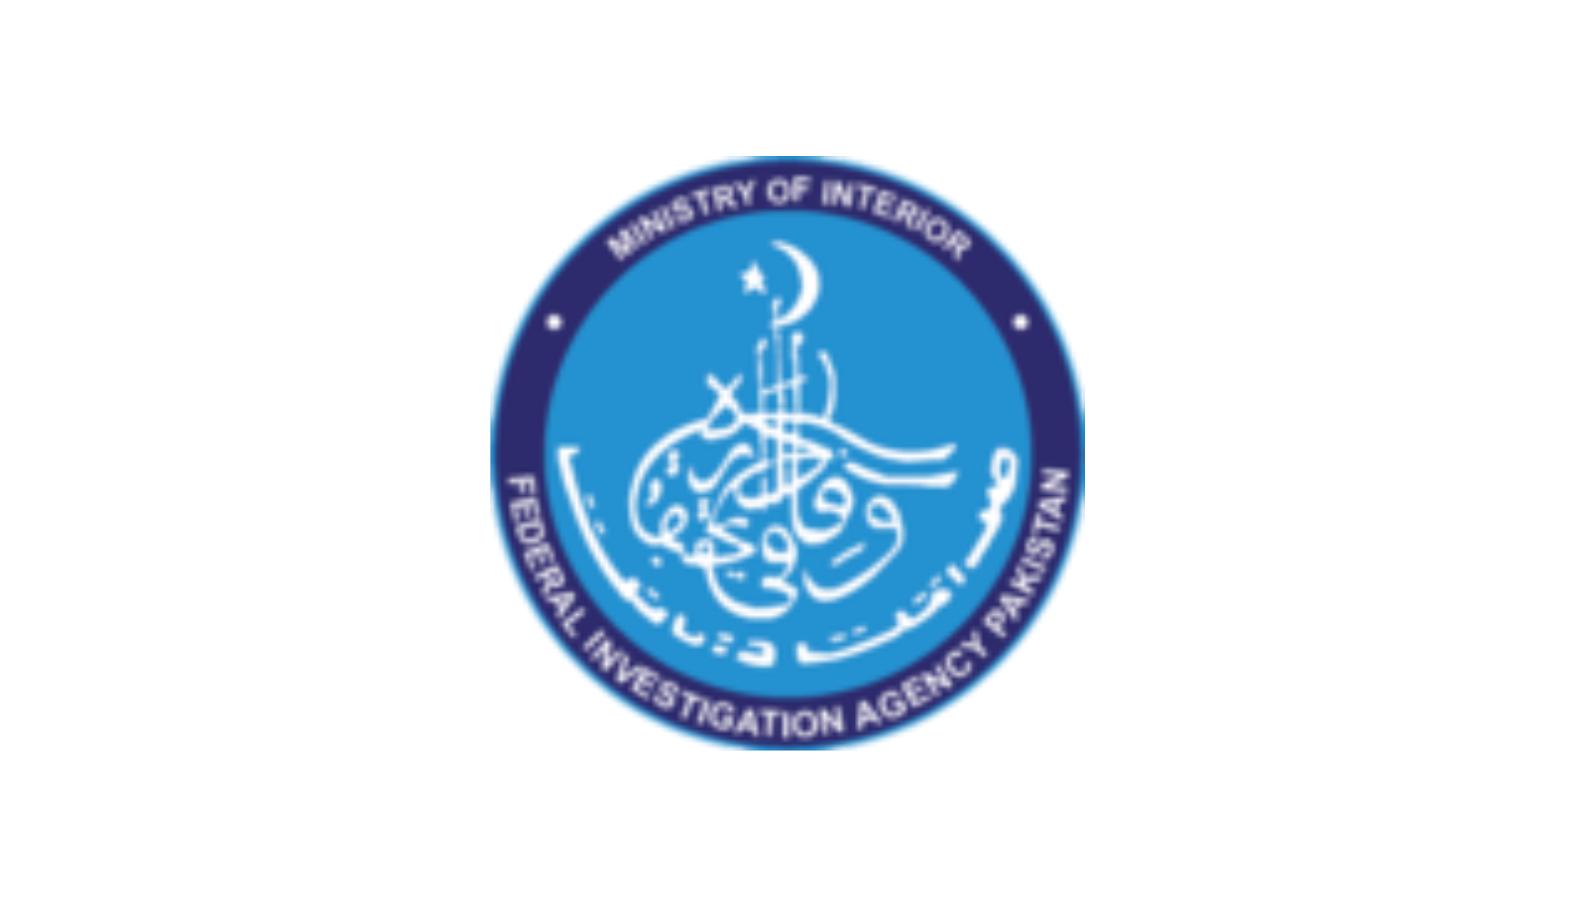 FIA Jobs 2021 - Federal Investigation Agency Jobs 2021 - 1143 FIA Upcoming Jobs 2021